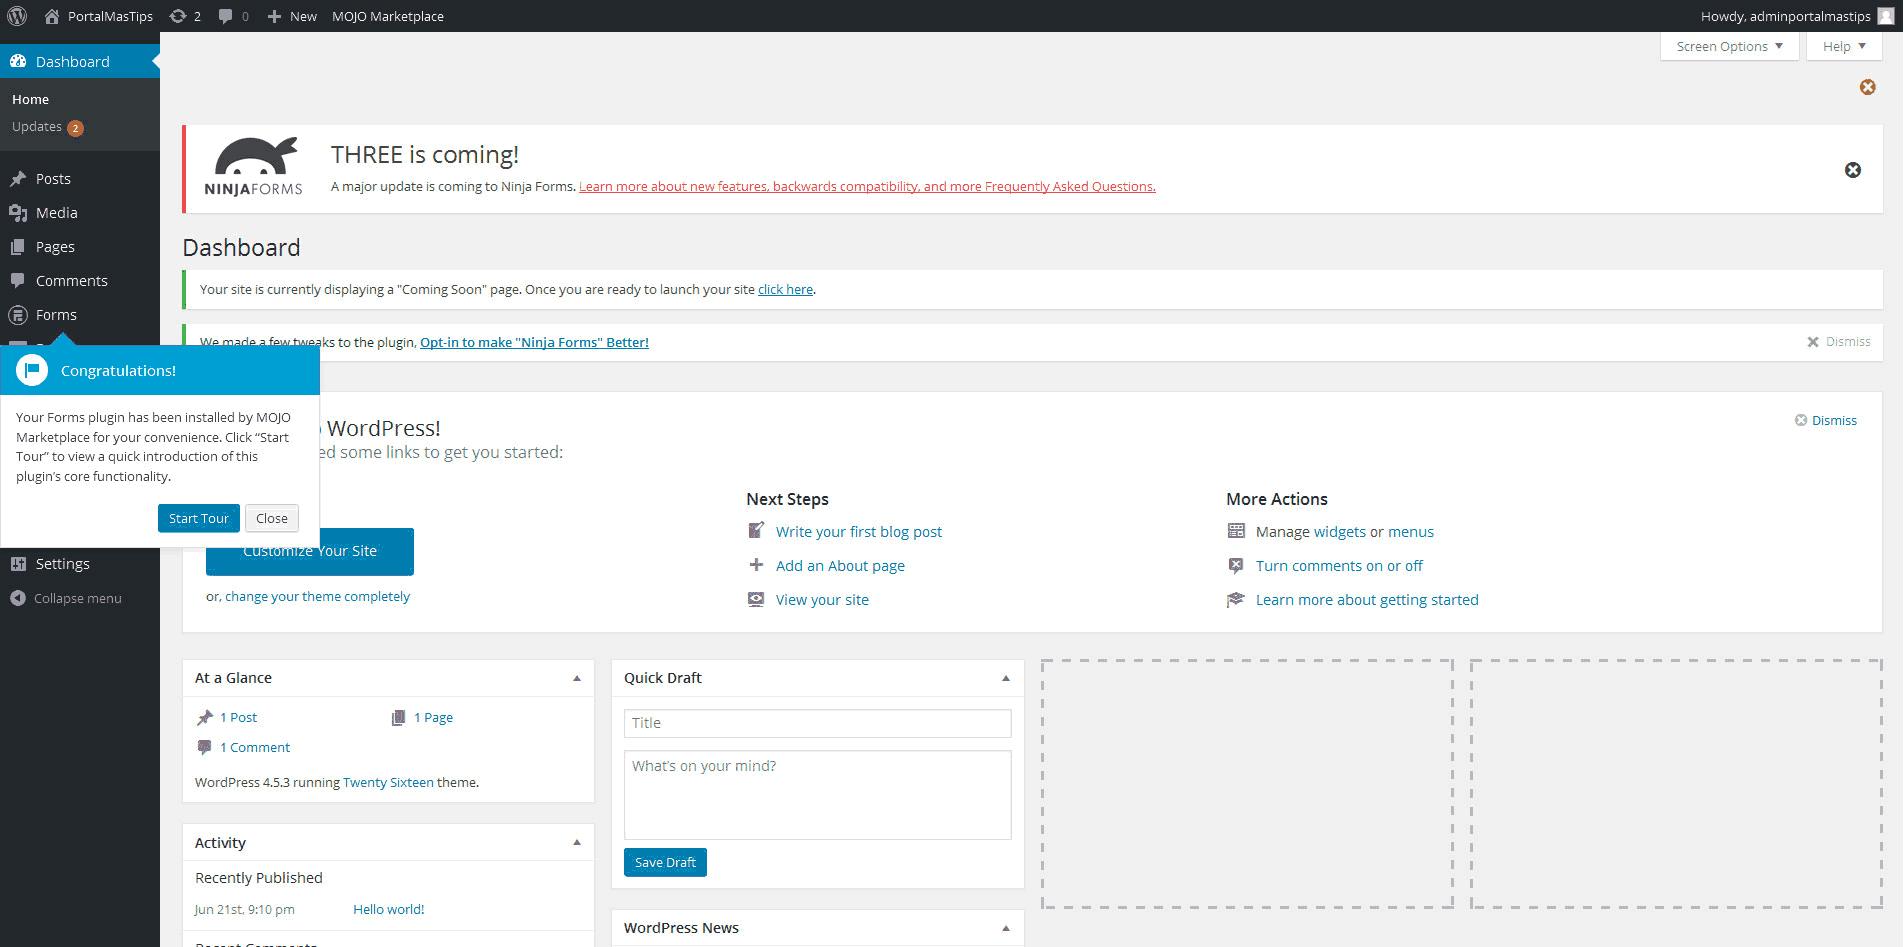 hostgator-primera-vista-al-panel-de-administracion-wordpress